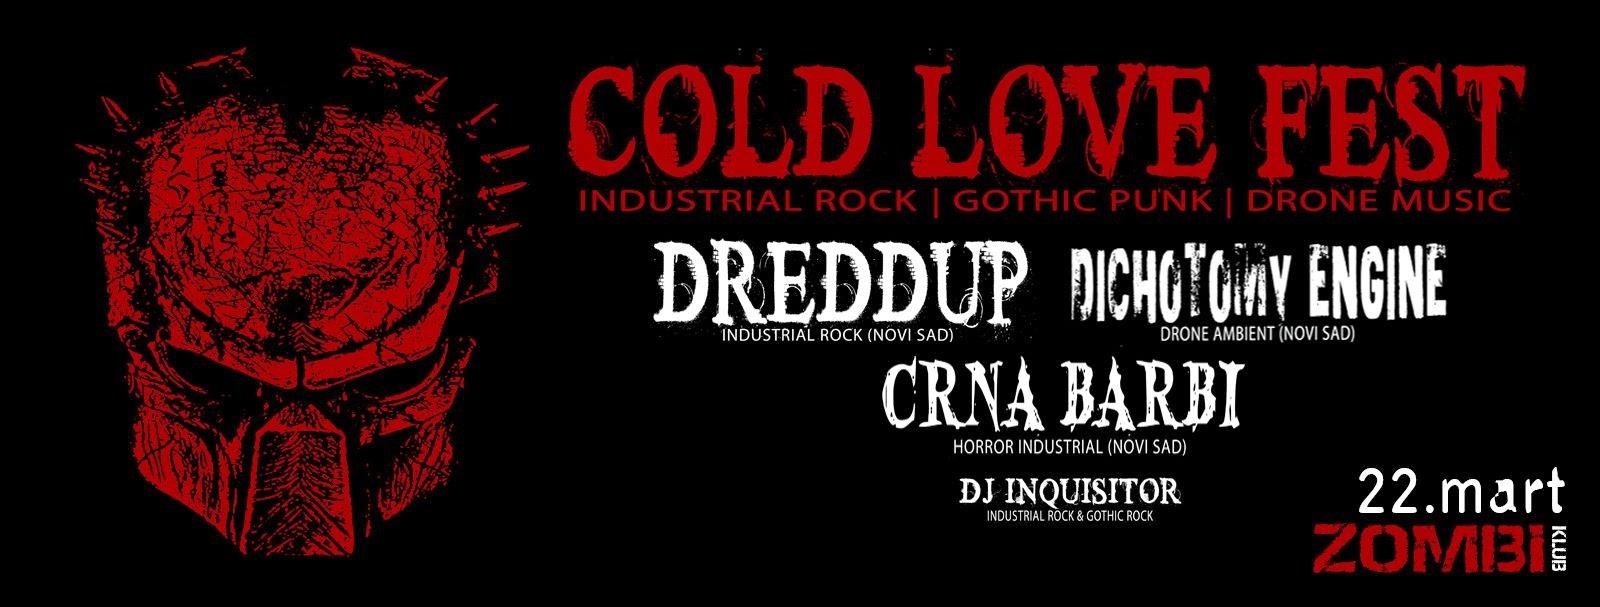 Cold Love Fest Dichotomy Engine